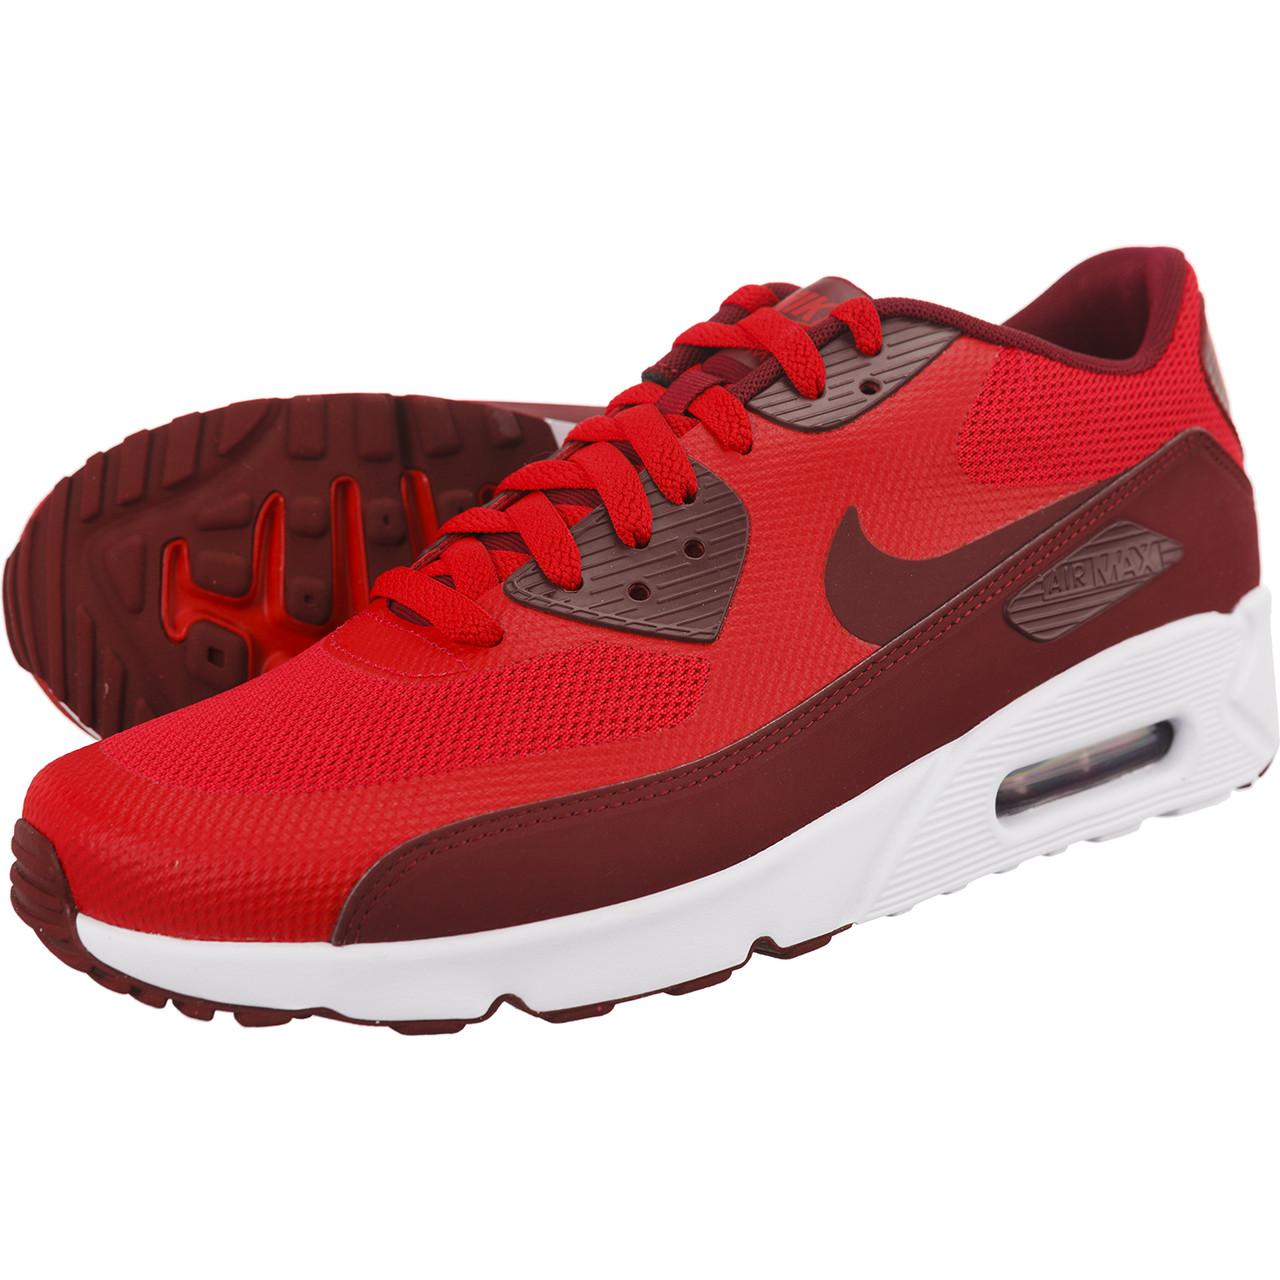 Buty Nike Air max 90 Ultra 2.0 Essential 600 w sklepie Eastend.pl! f498c06b4